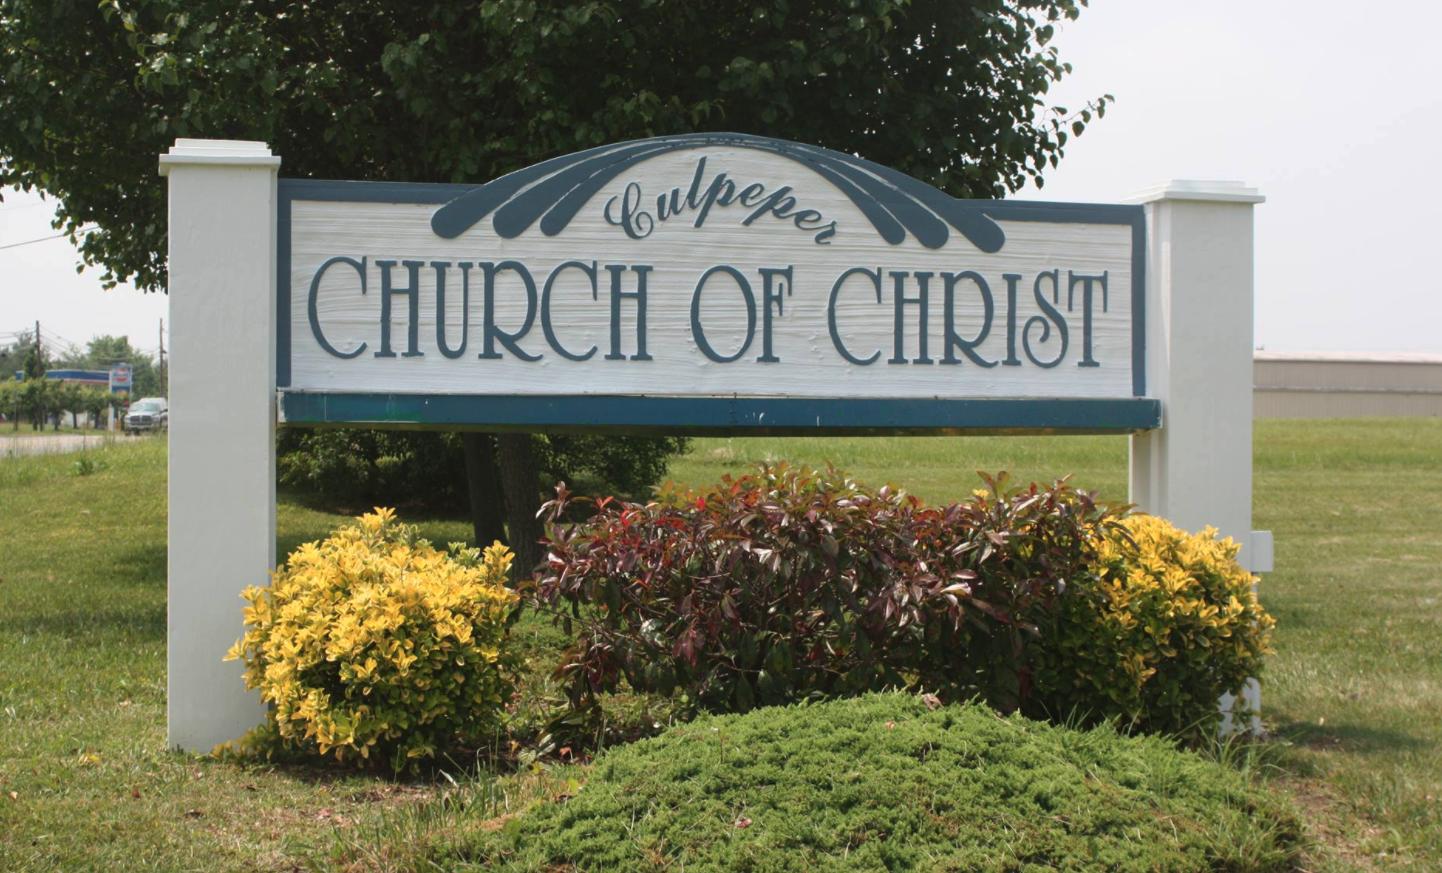 Culpeper church of Christ